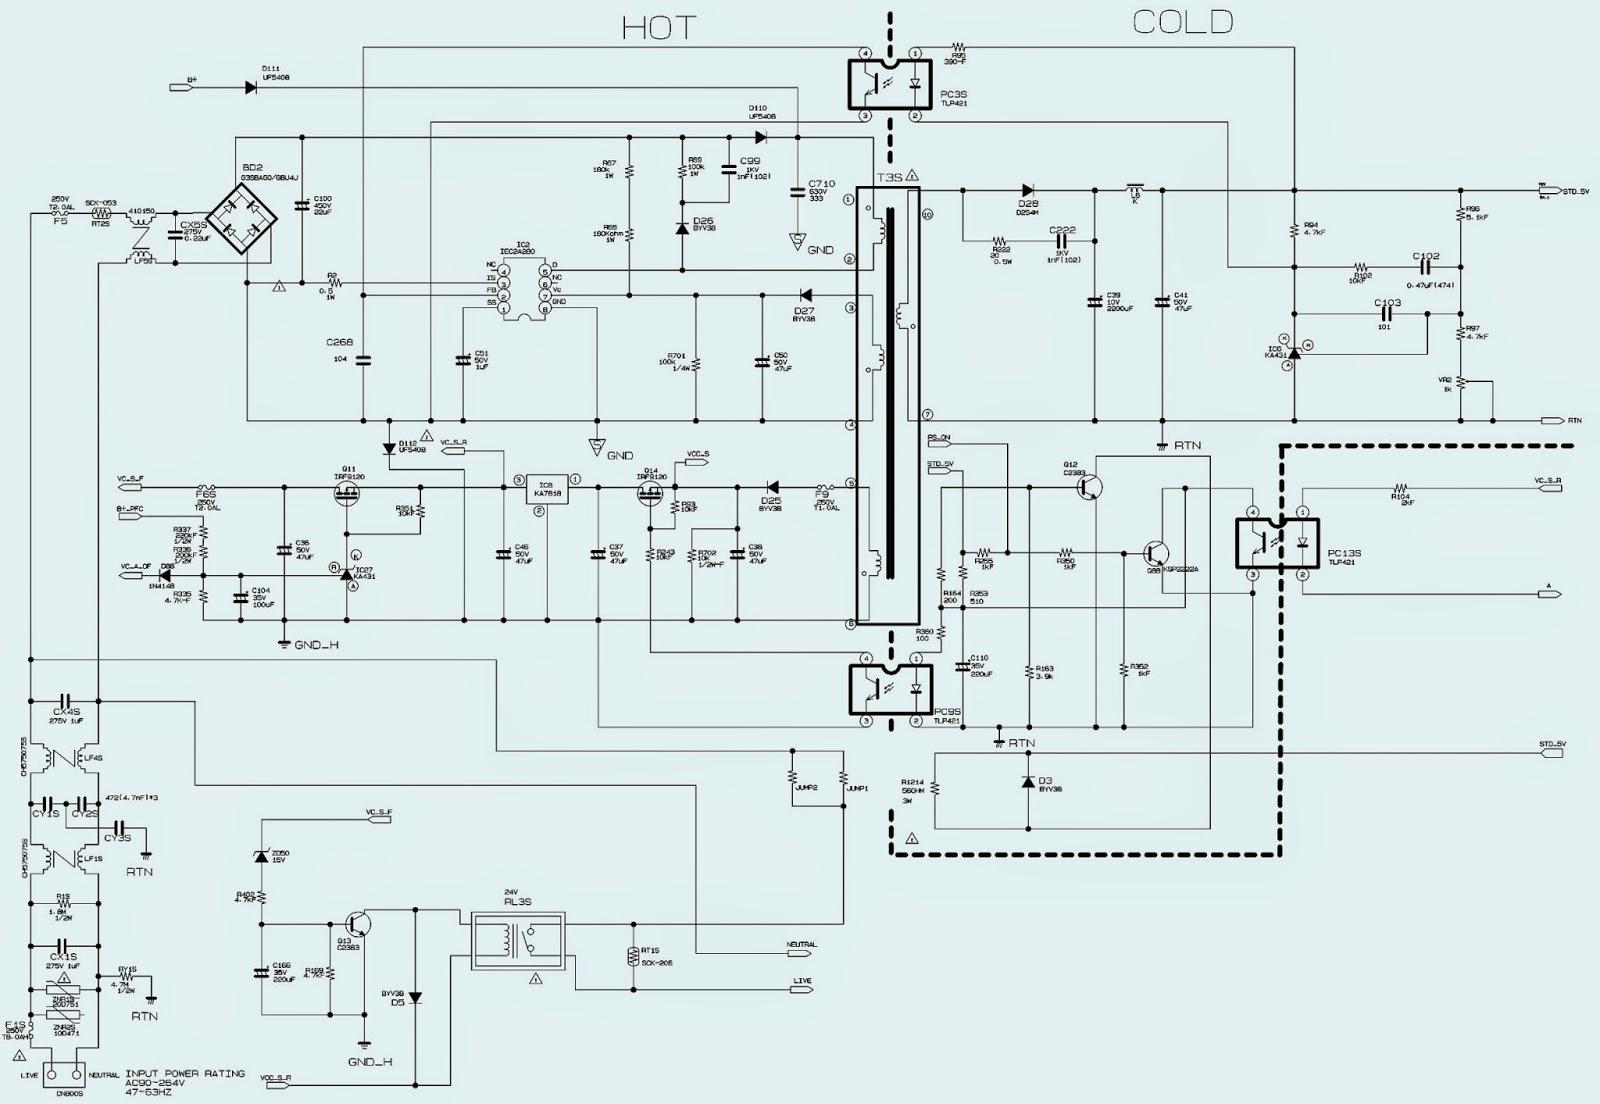 bn 96 samsung power supply schematic circuit diagram electro help samsung lcd tv power [ 1600 x 1104 Pixel ]